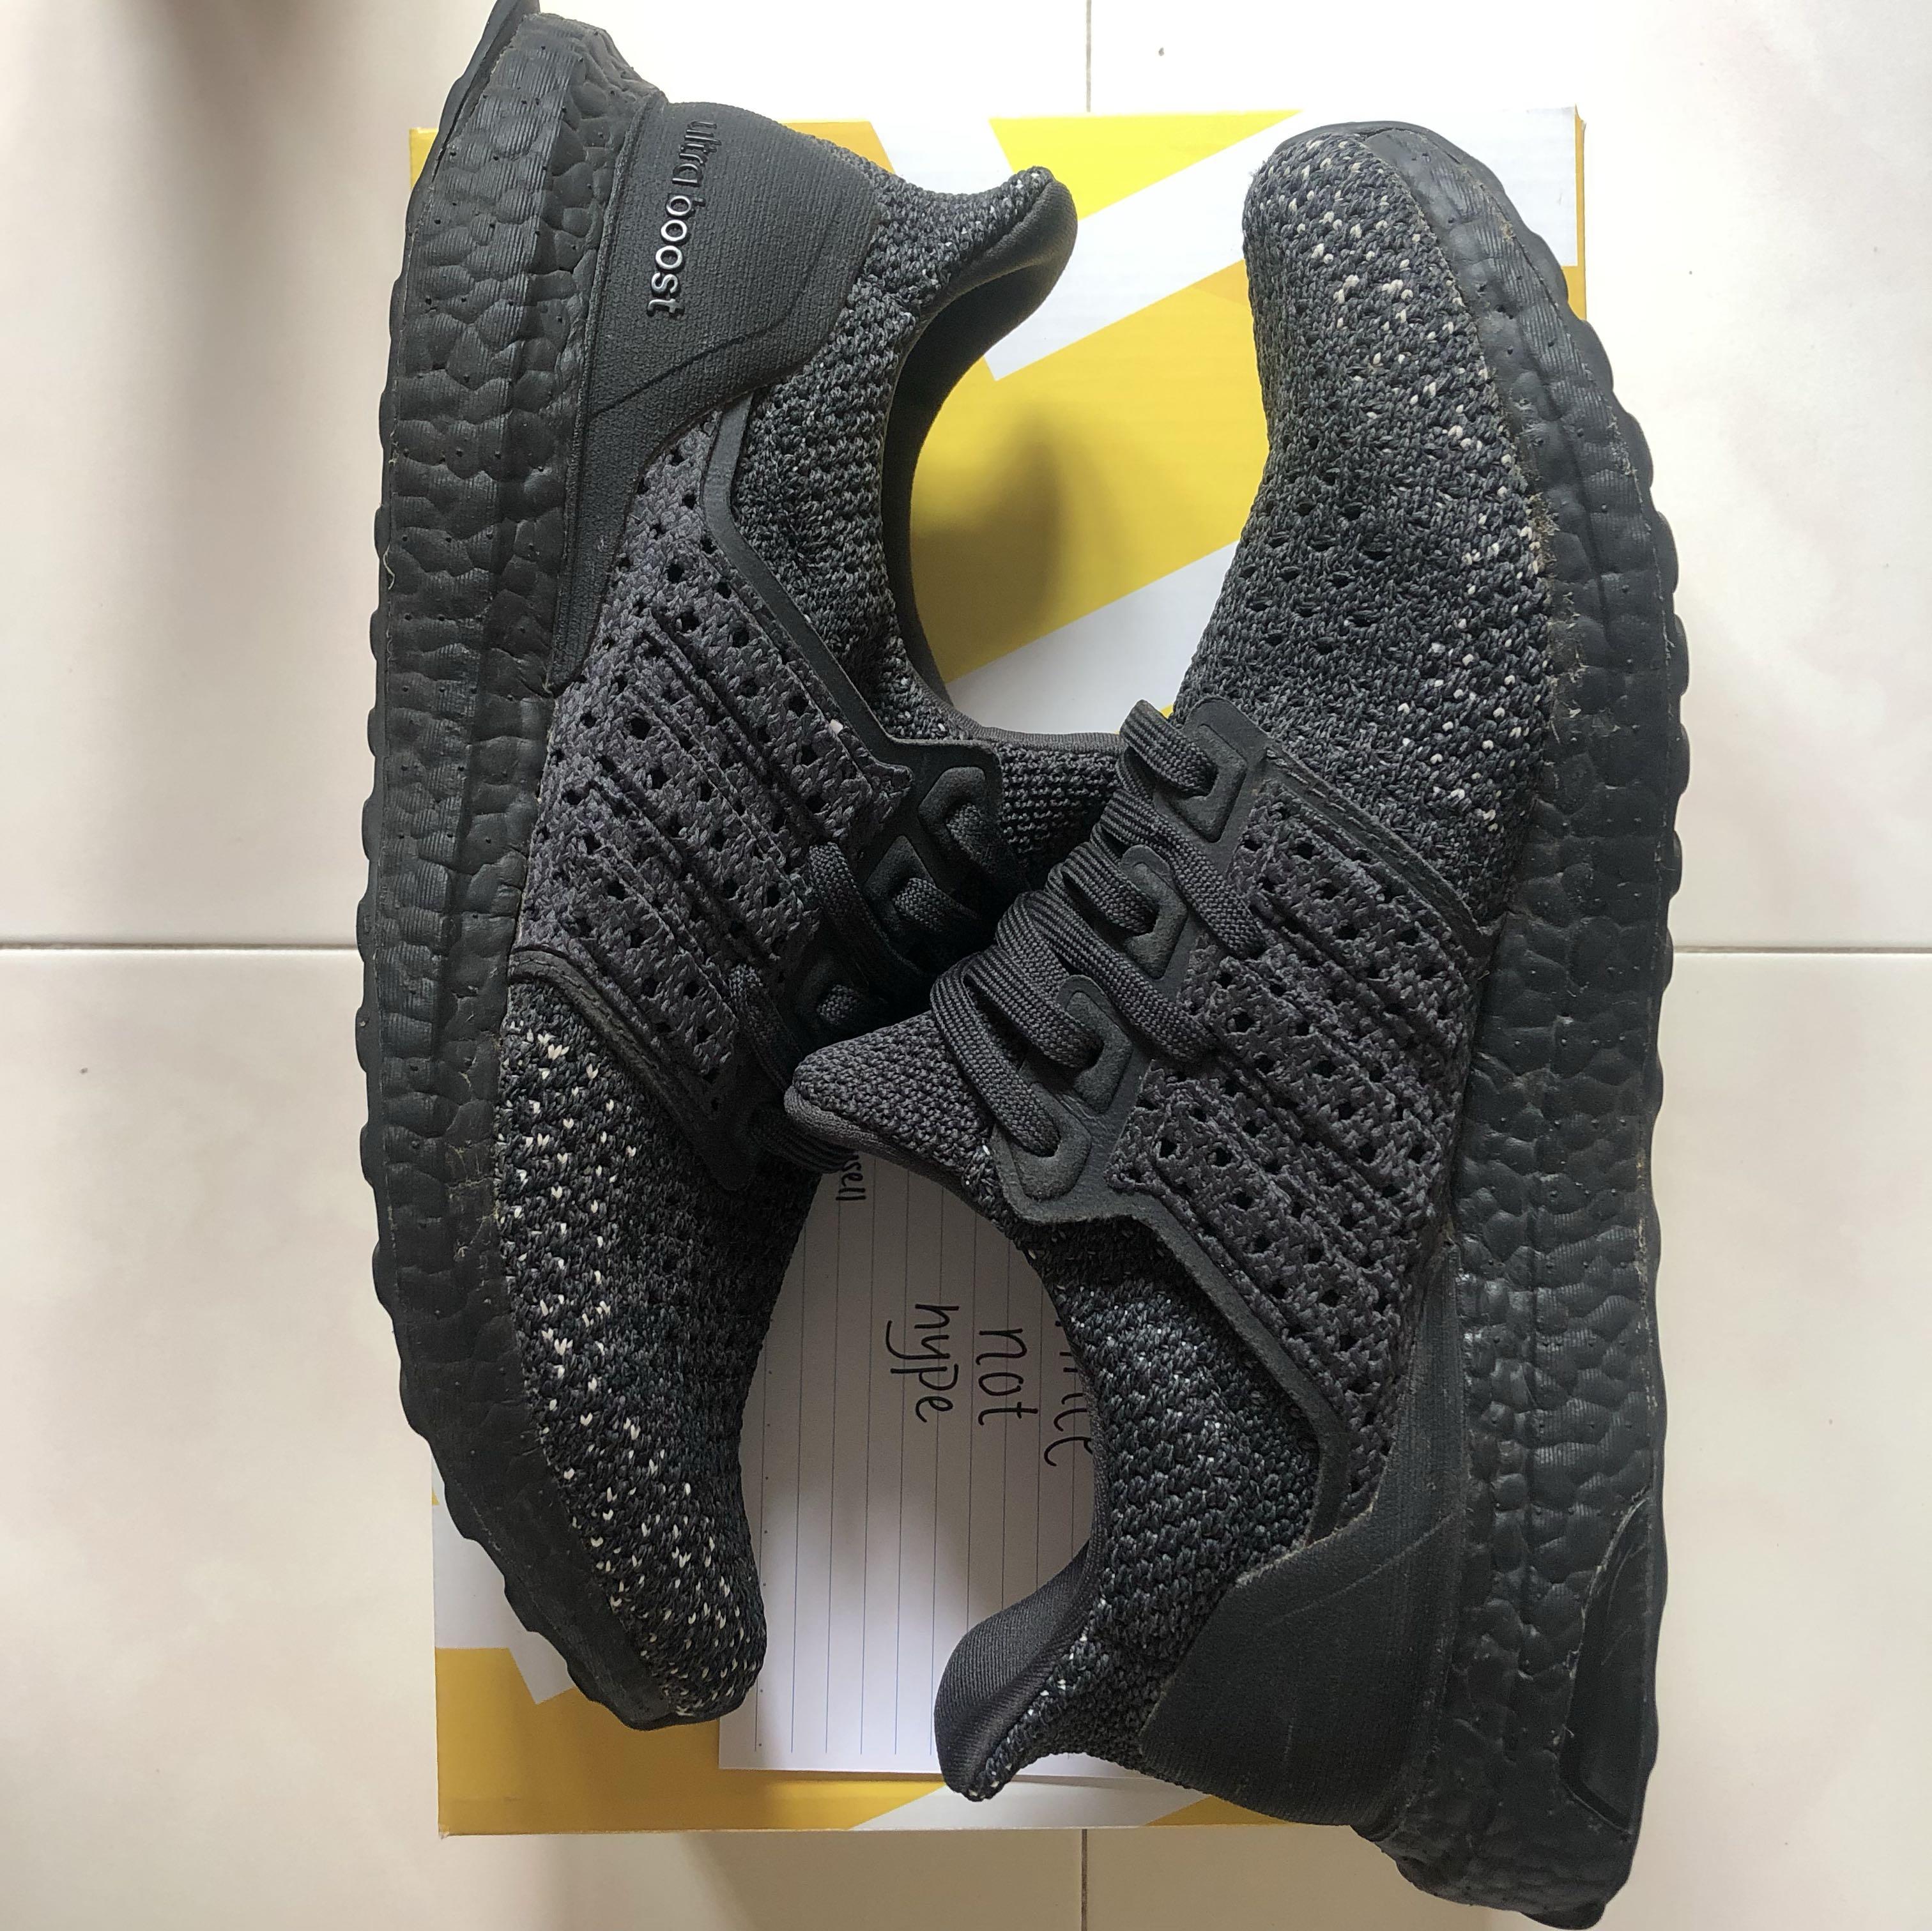 360b7c1b1dcd0 Adidas Ultraboost Clima Triple Black US 8